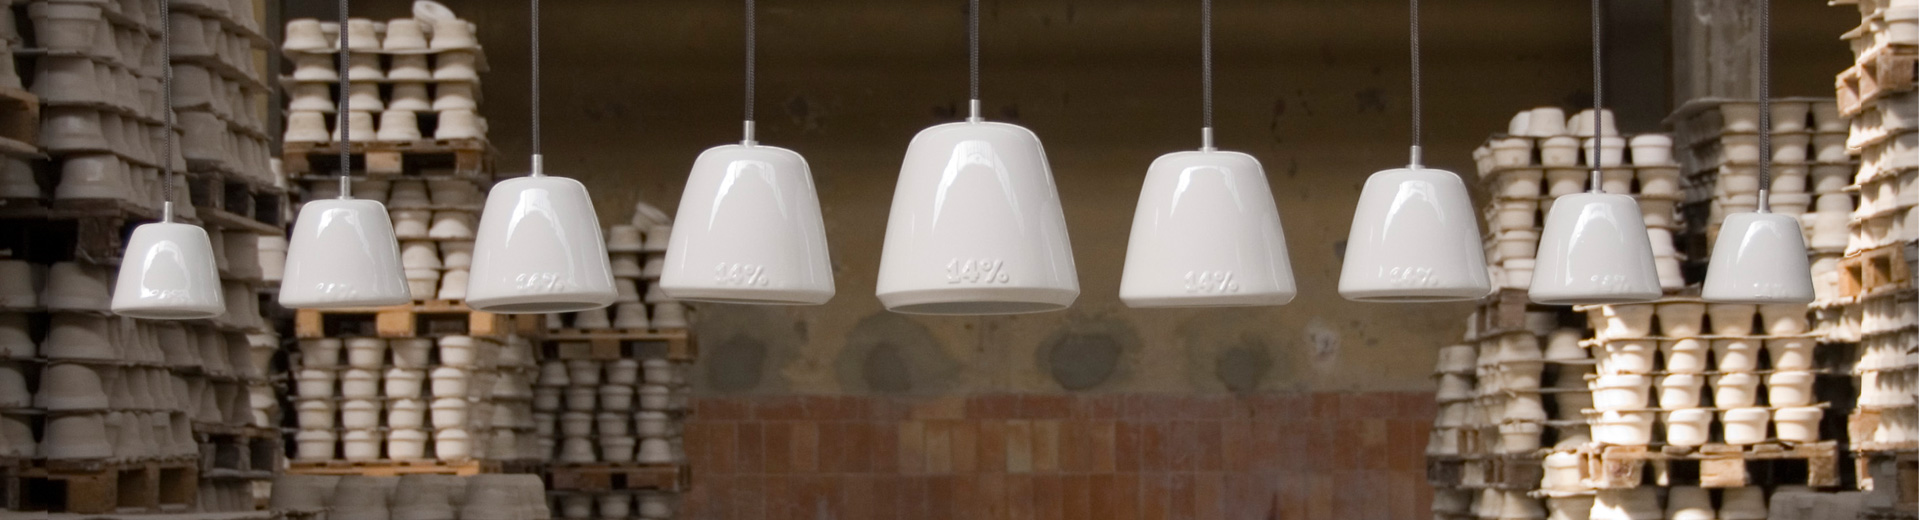 Design-Leuchten aus Keramik